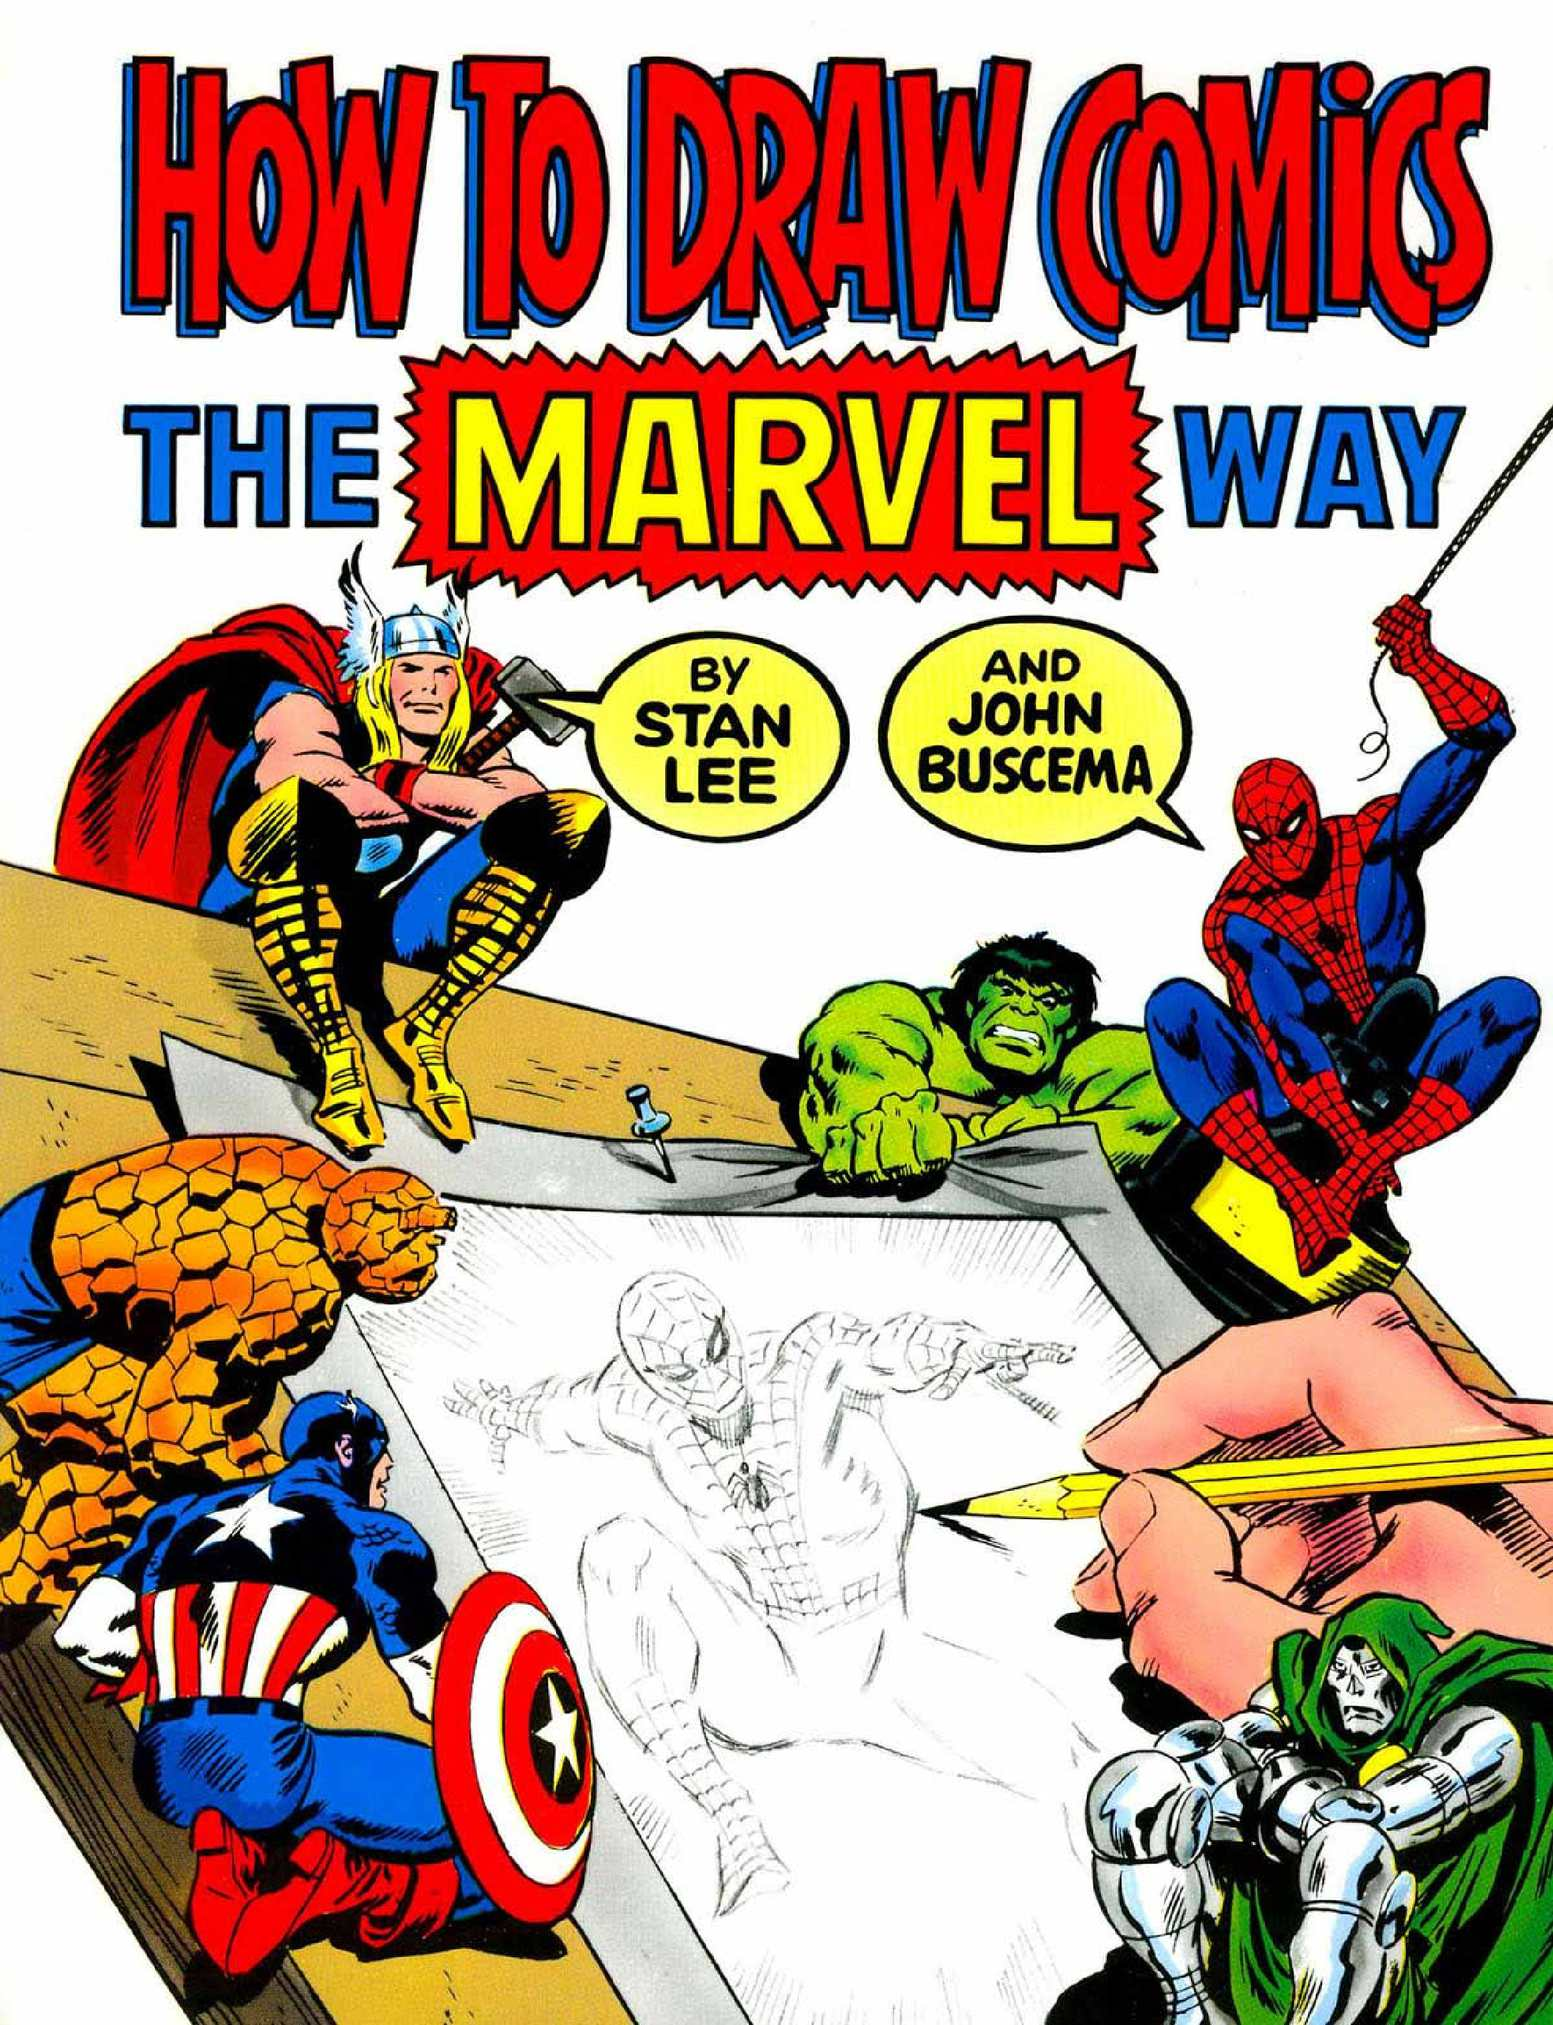 Dibujar comics Marvel